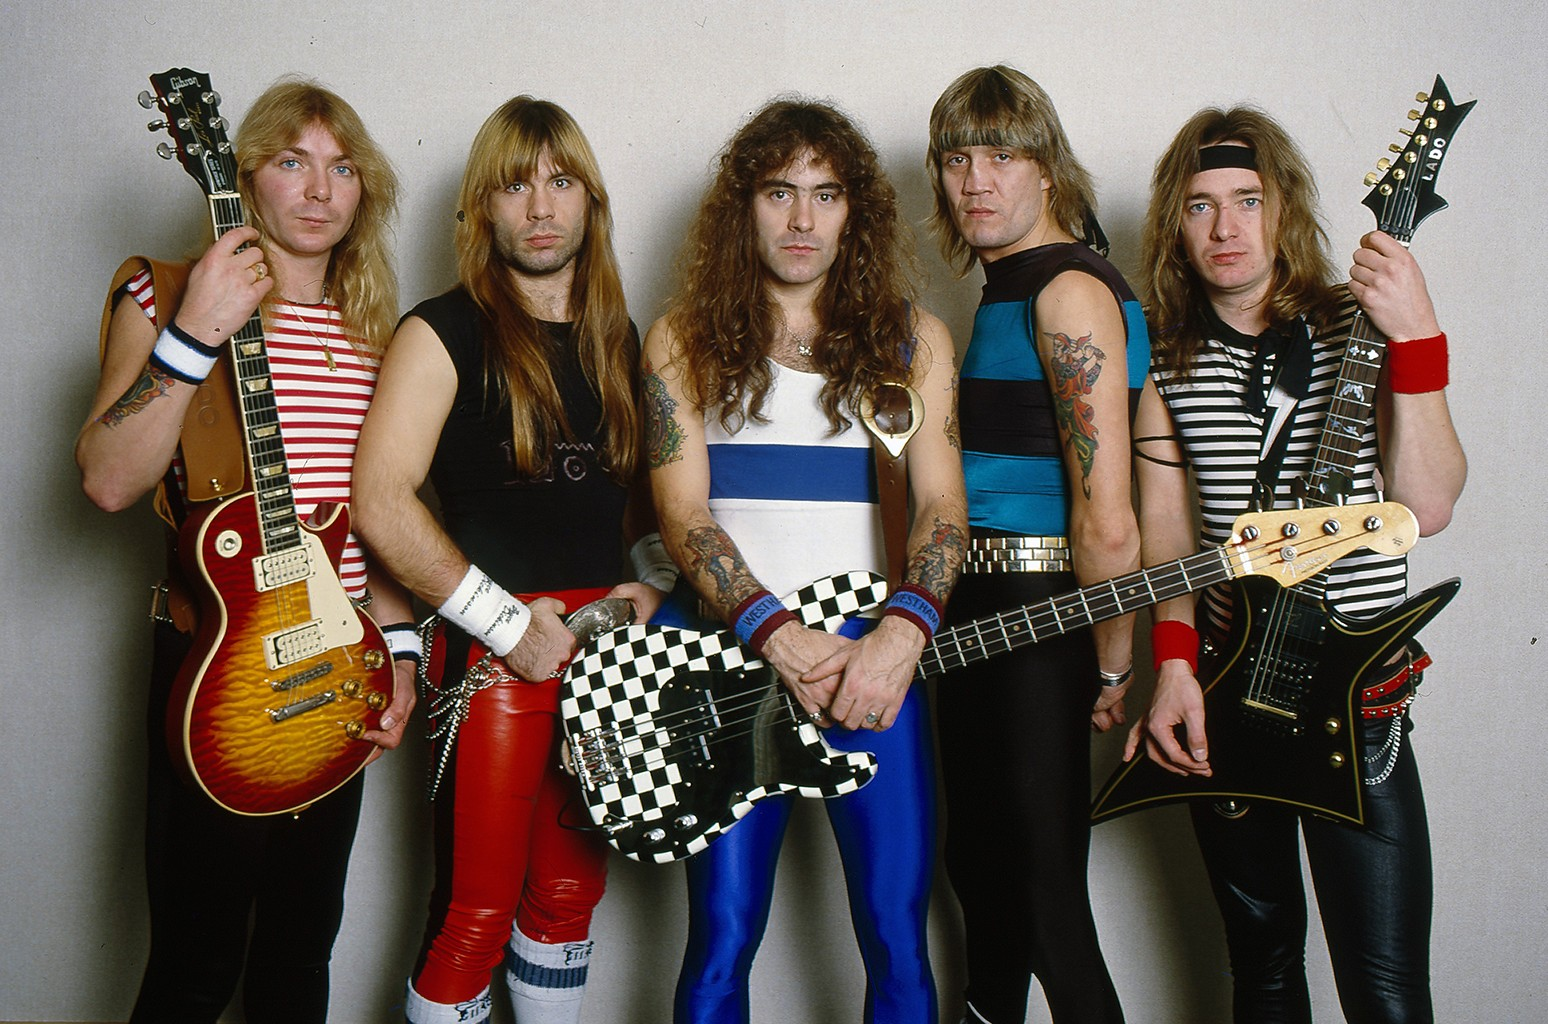 Mandatory Credit: Photo by Ilpo Musto/REX/Shutterstock (1270764n) Iron Maiden - Dave Murray, Steve Harris, Nicko McBrain, Bruce Dickinson and Adrian Smith Iron Maiden - 1988